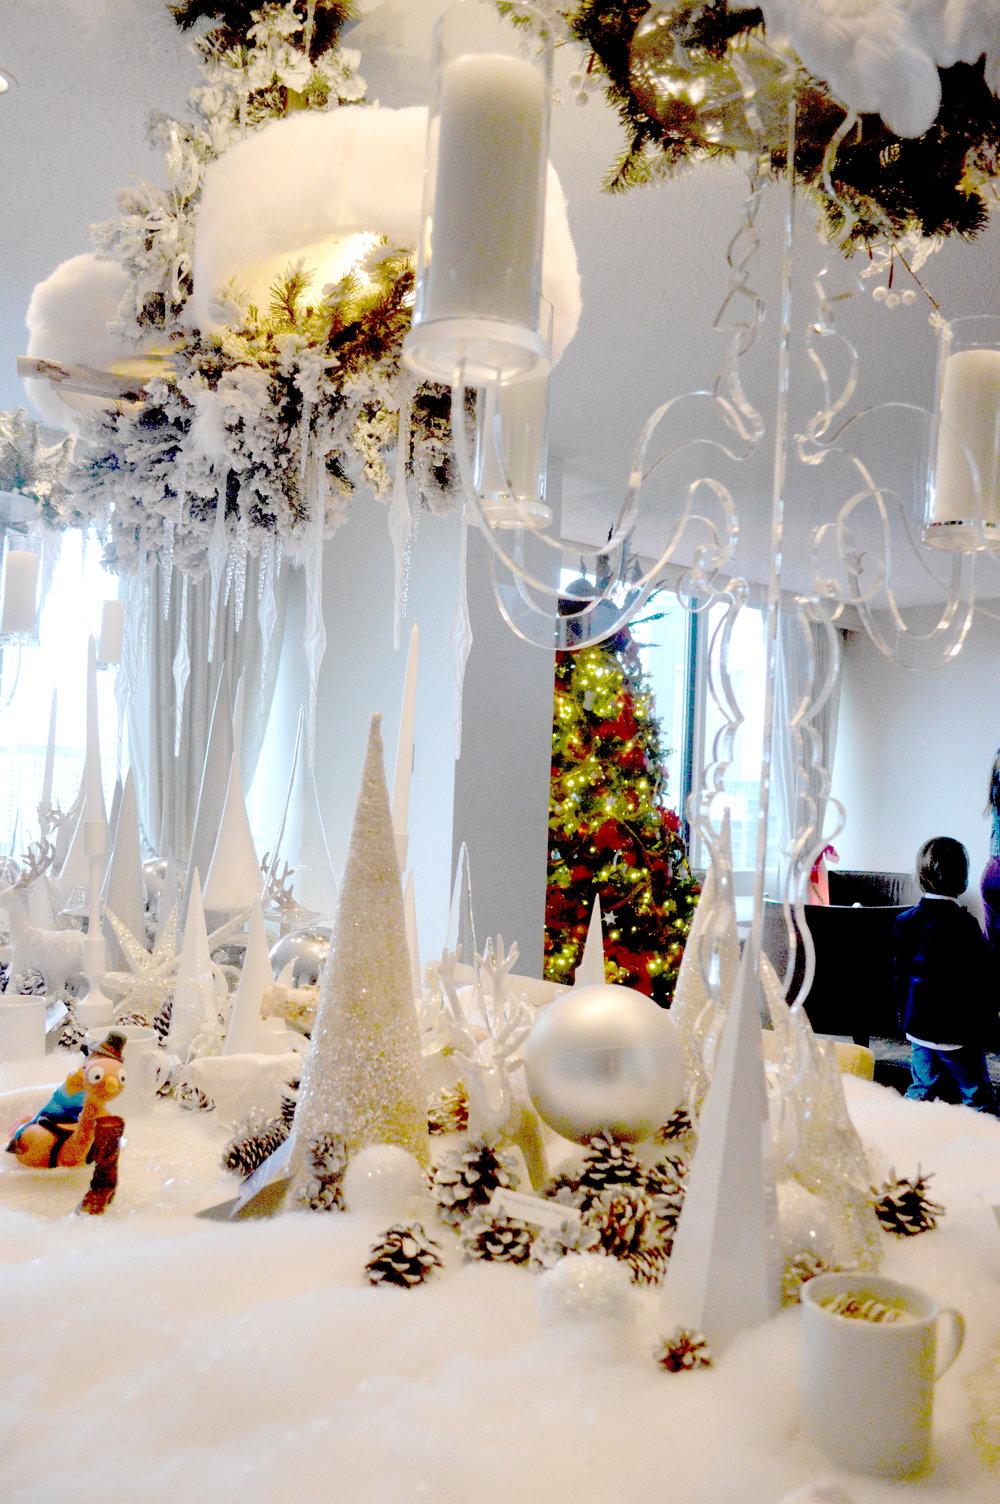 santa suite at the Swissotel